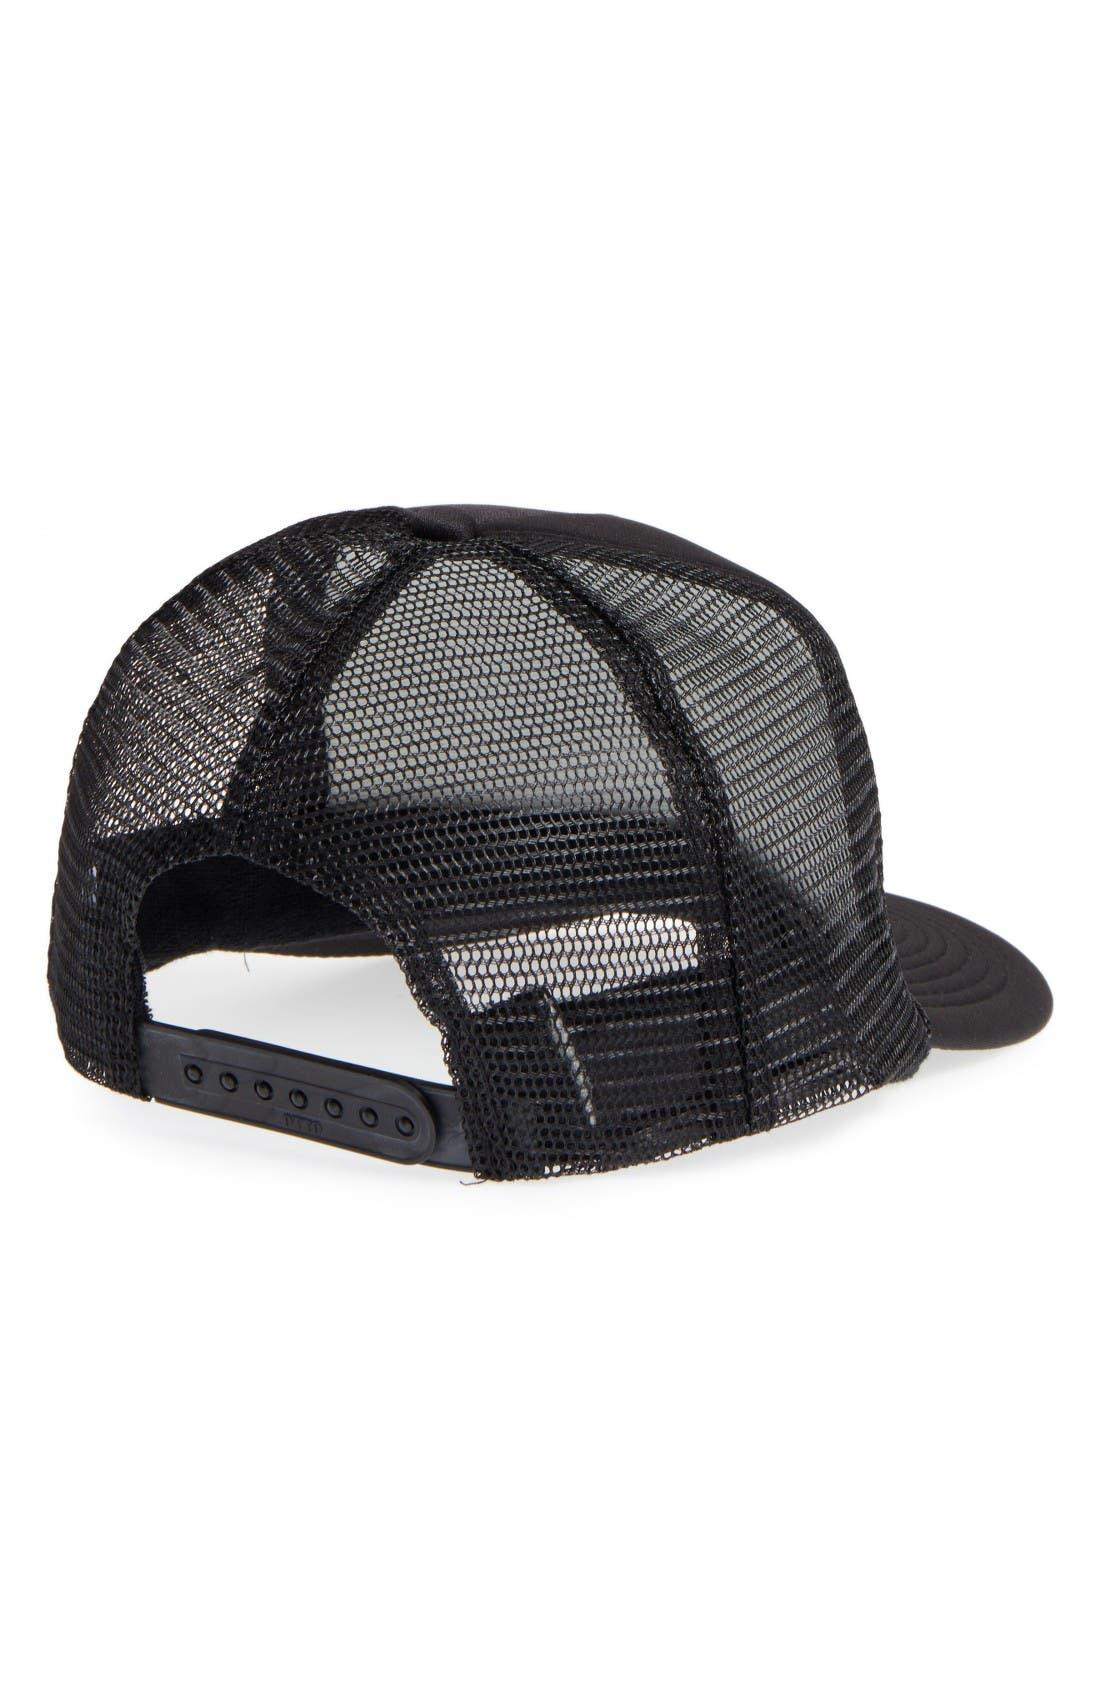 Hot Mess Trucker Hat,                             Alternate thumbnail 2, color,                             Black